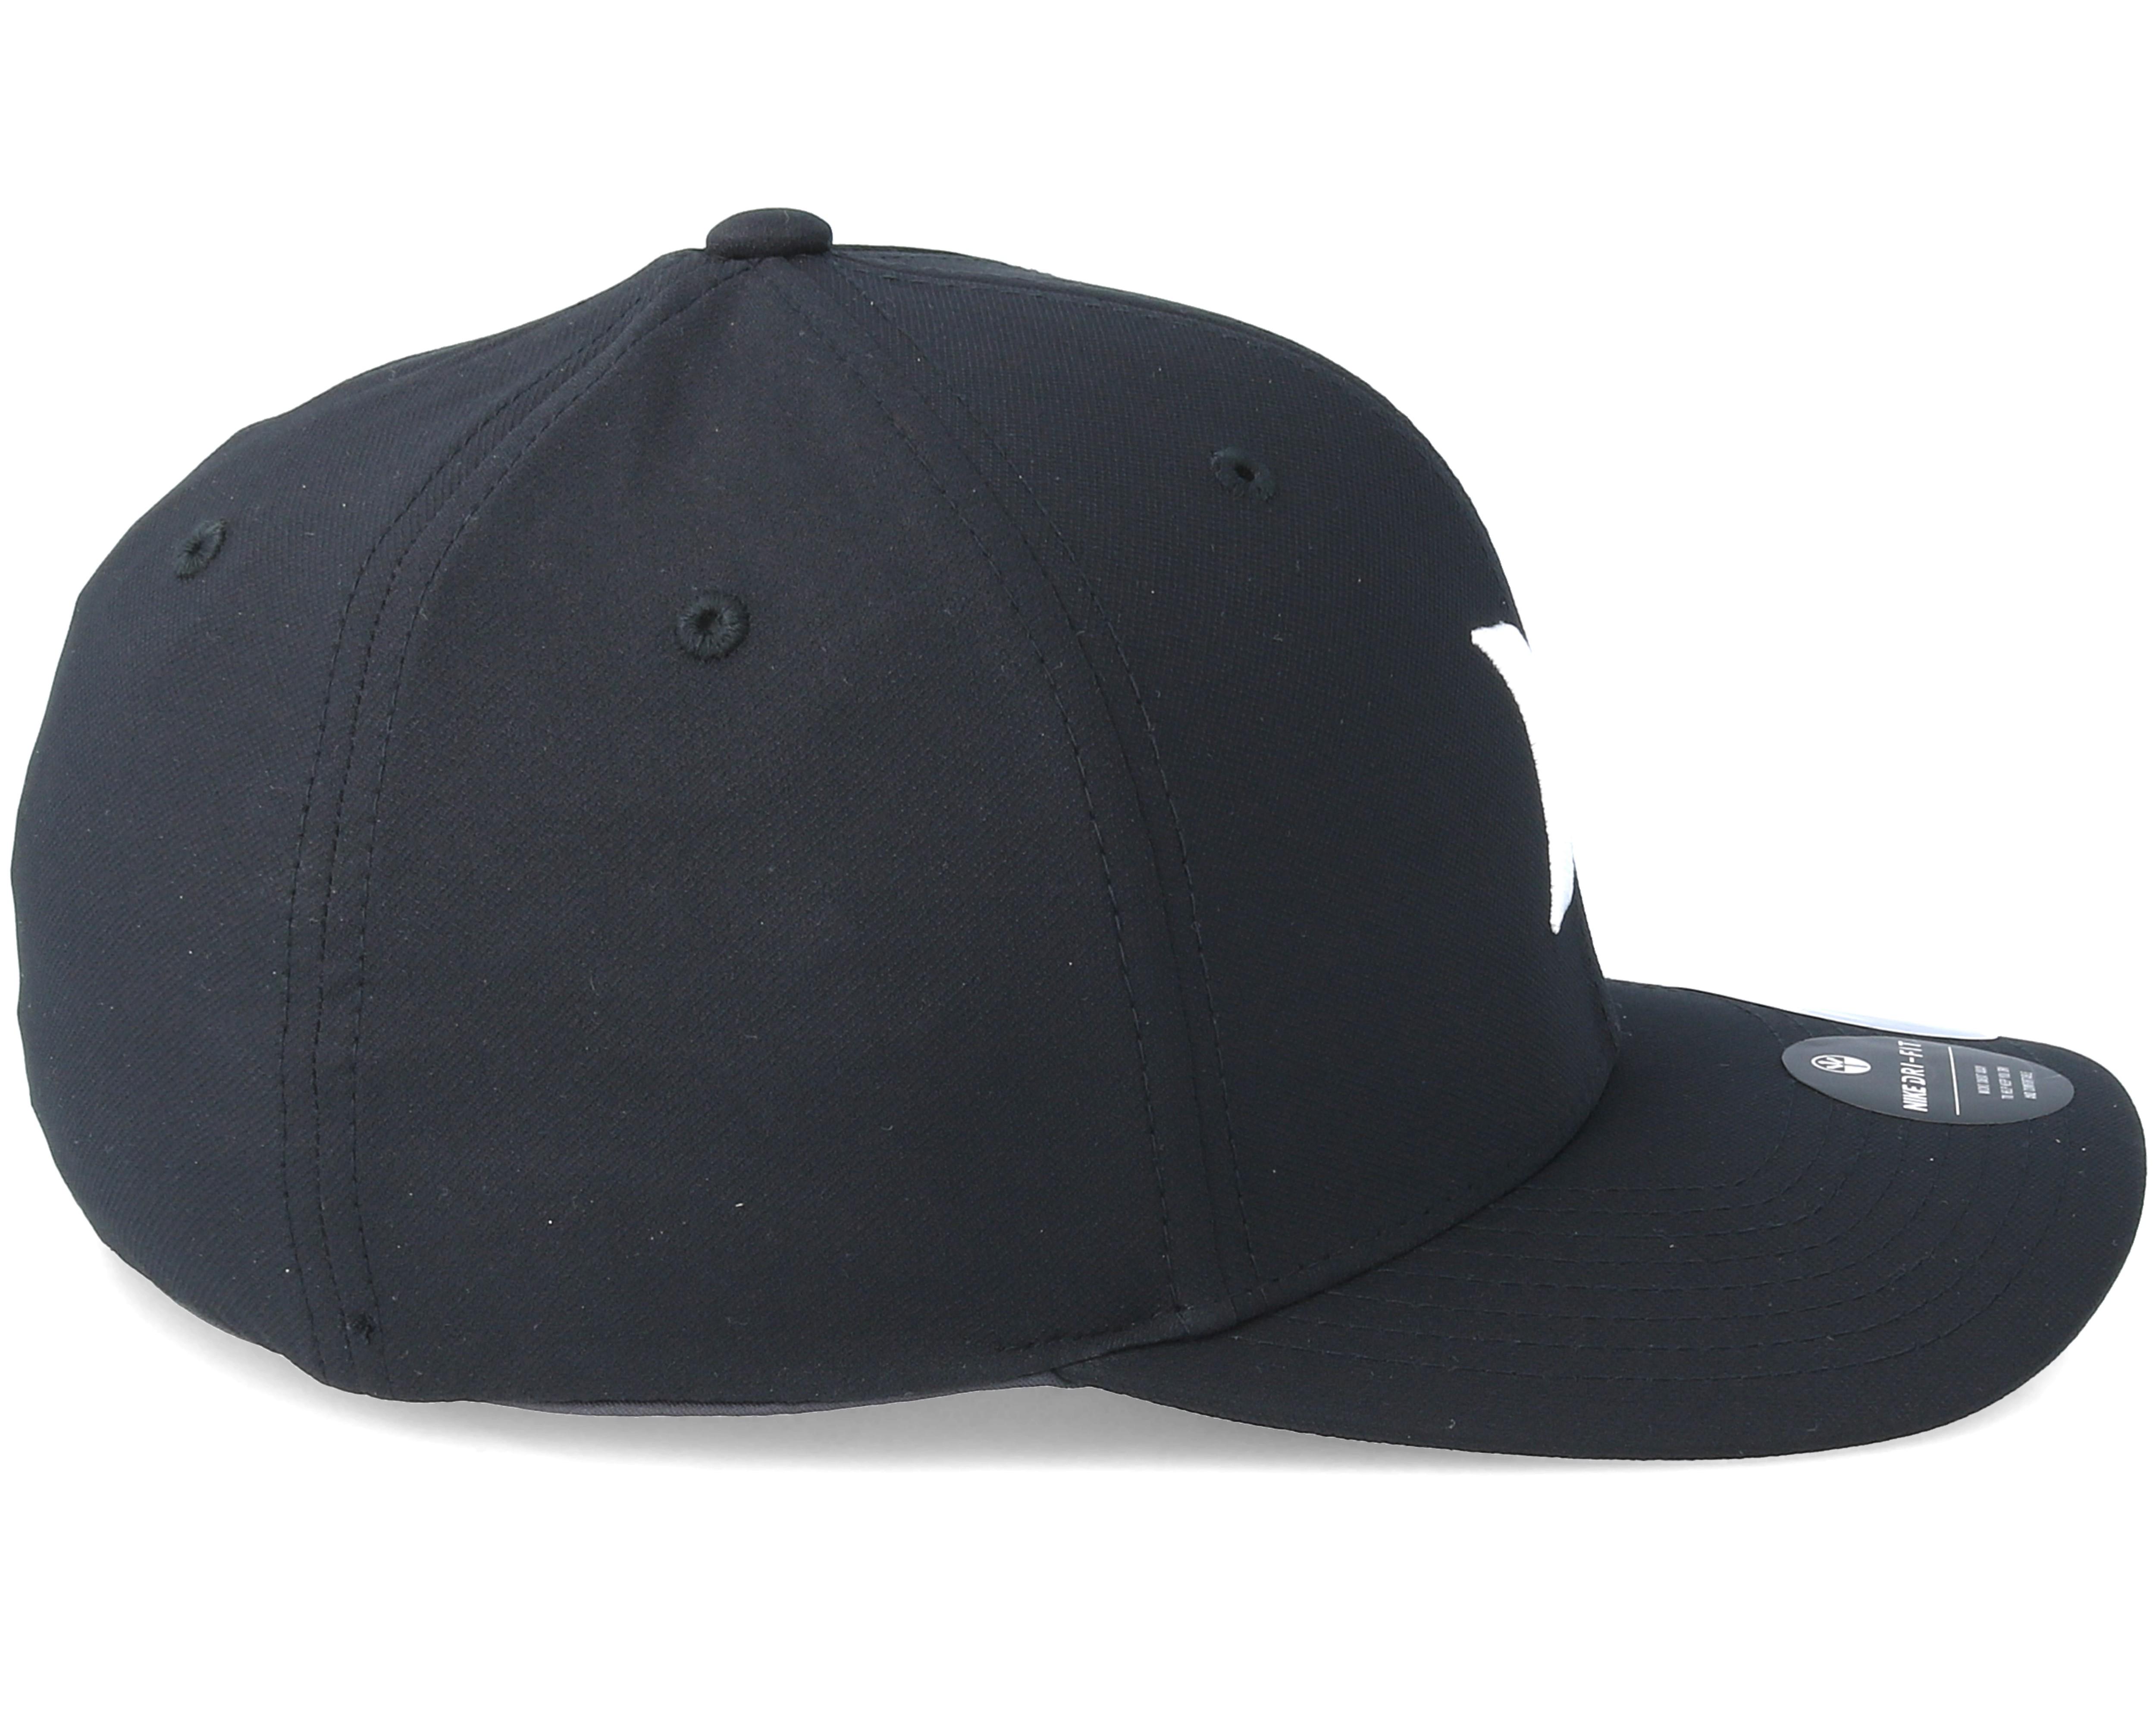 Dri Fit One Amp Only Black Flexfit Hurley Caps Hatstore